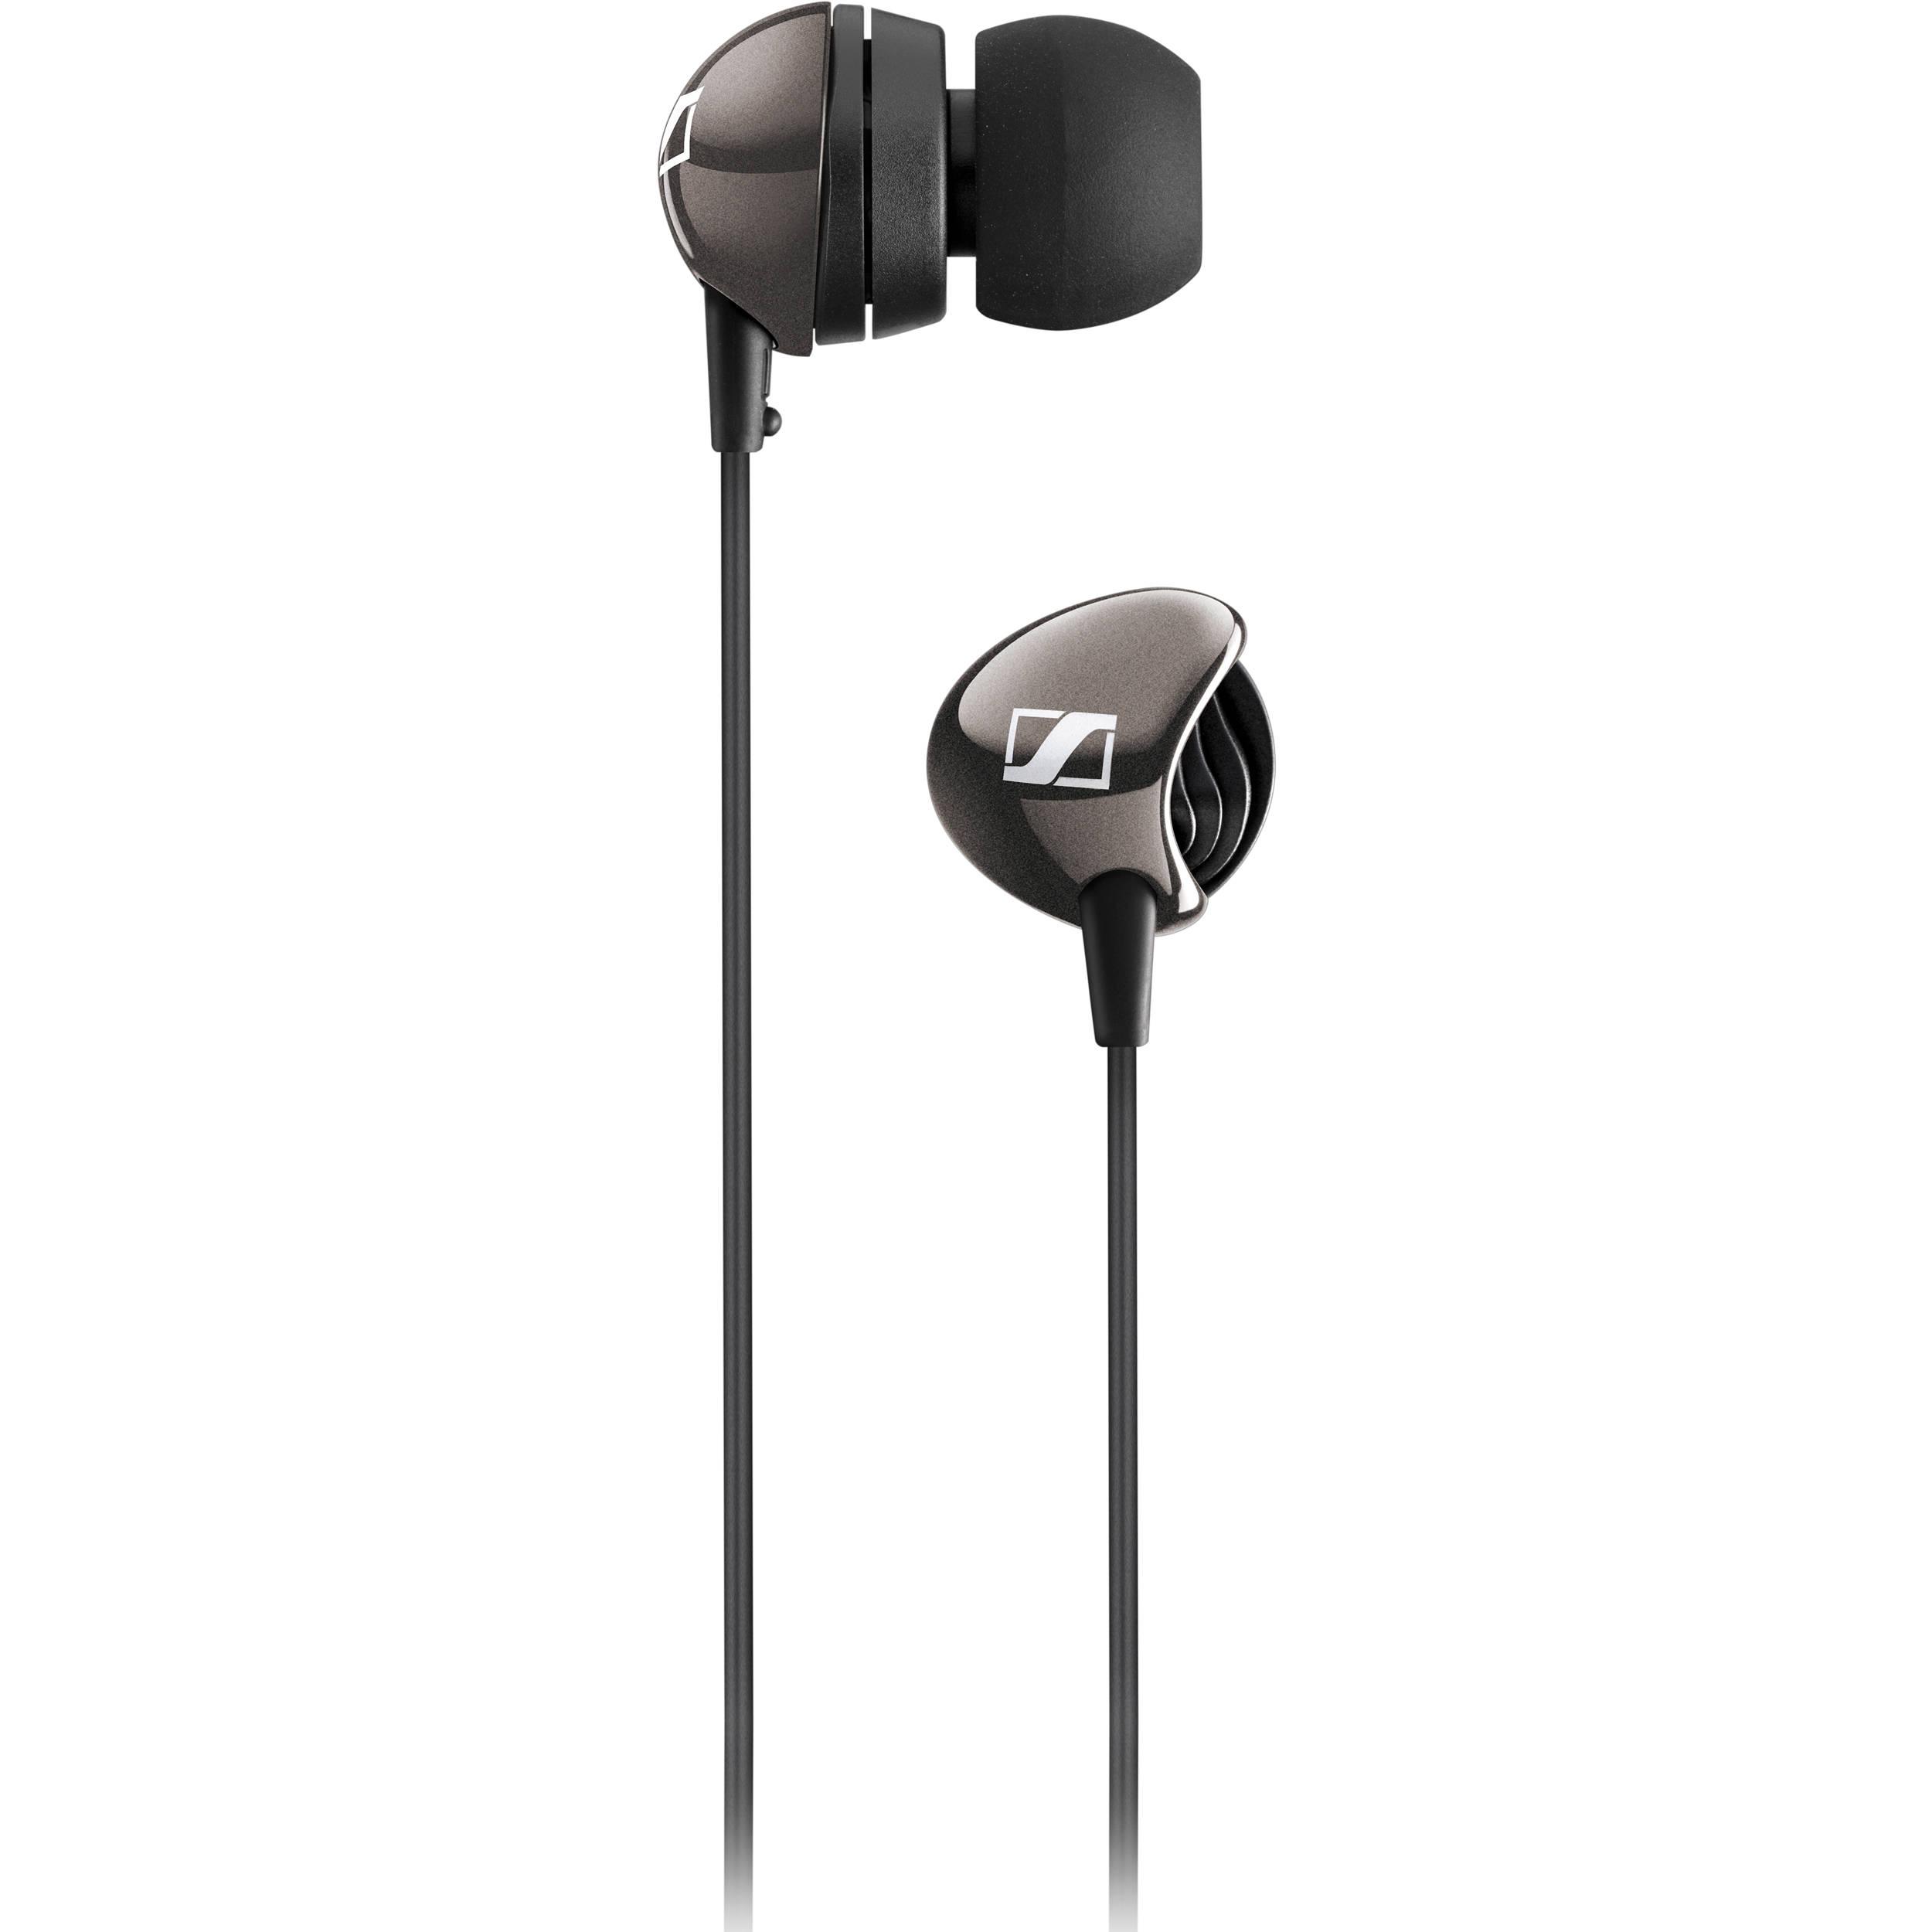 Sennheiser CX 275 Universal In-Ear Headset 504538 B&H